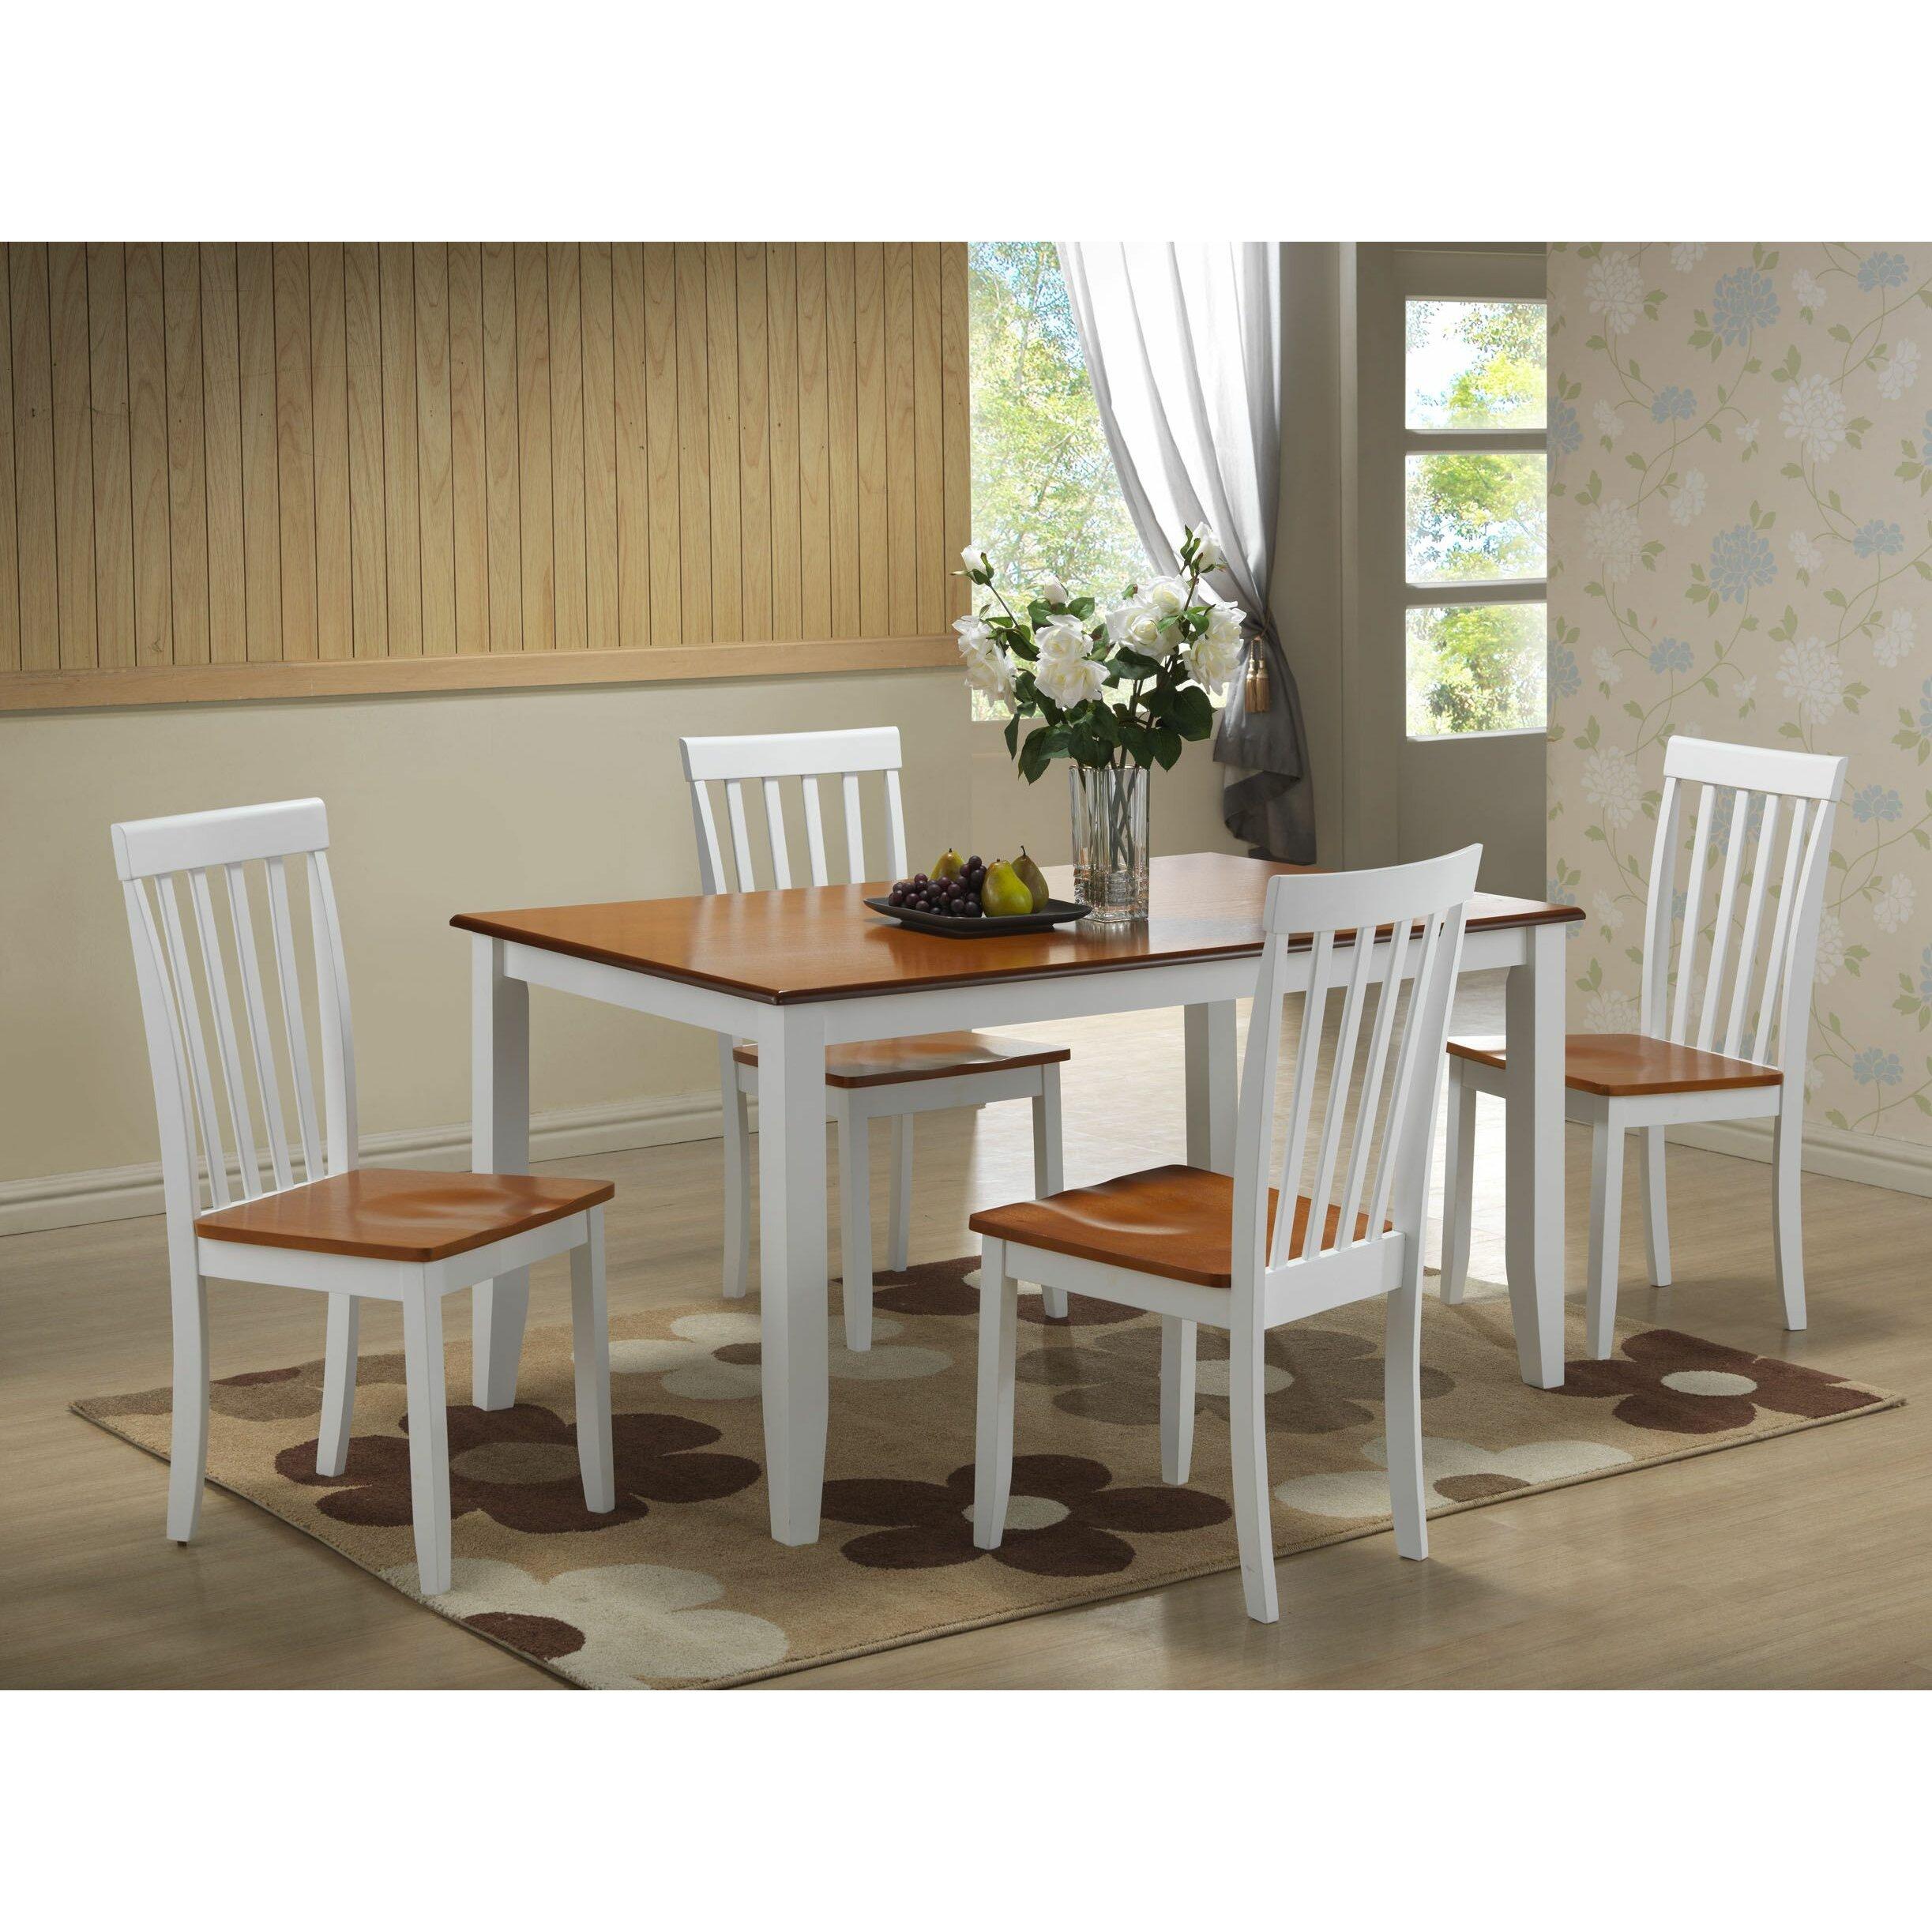 Five Piece Dining Room Sets: Alcott Hill Ann 5 Piece Dining Set & Reviews